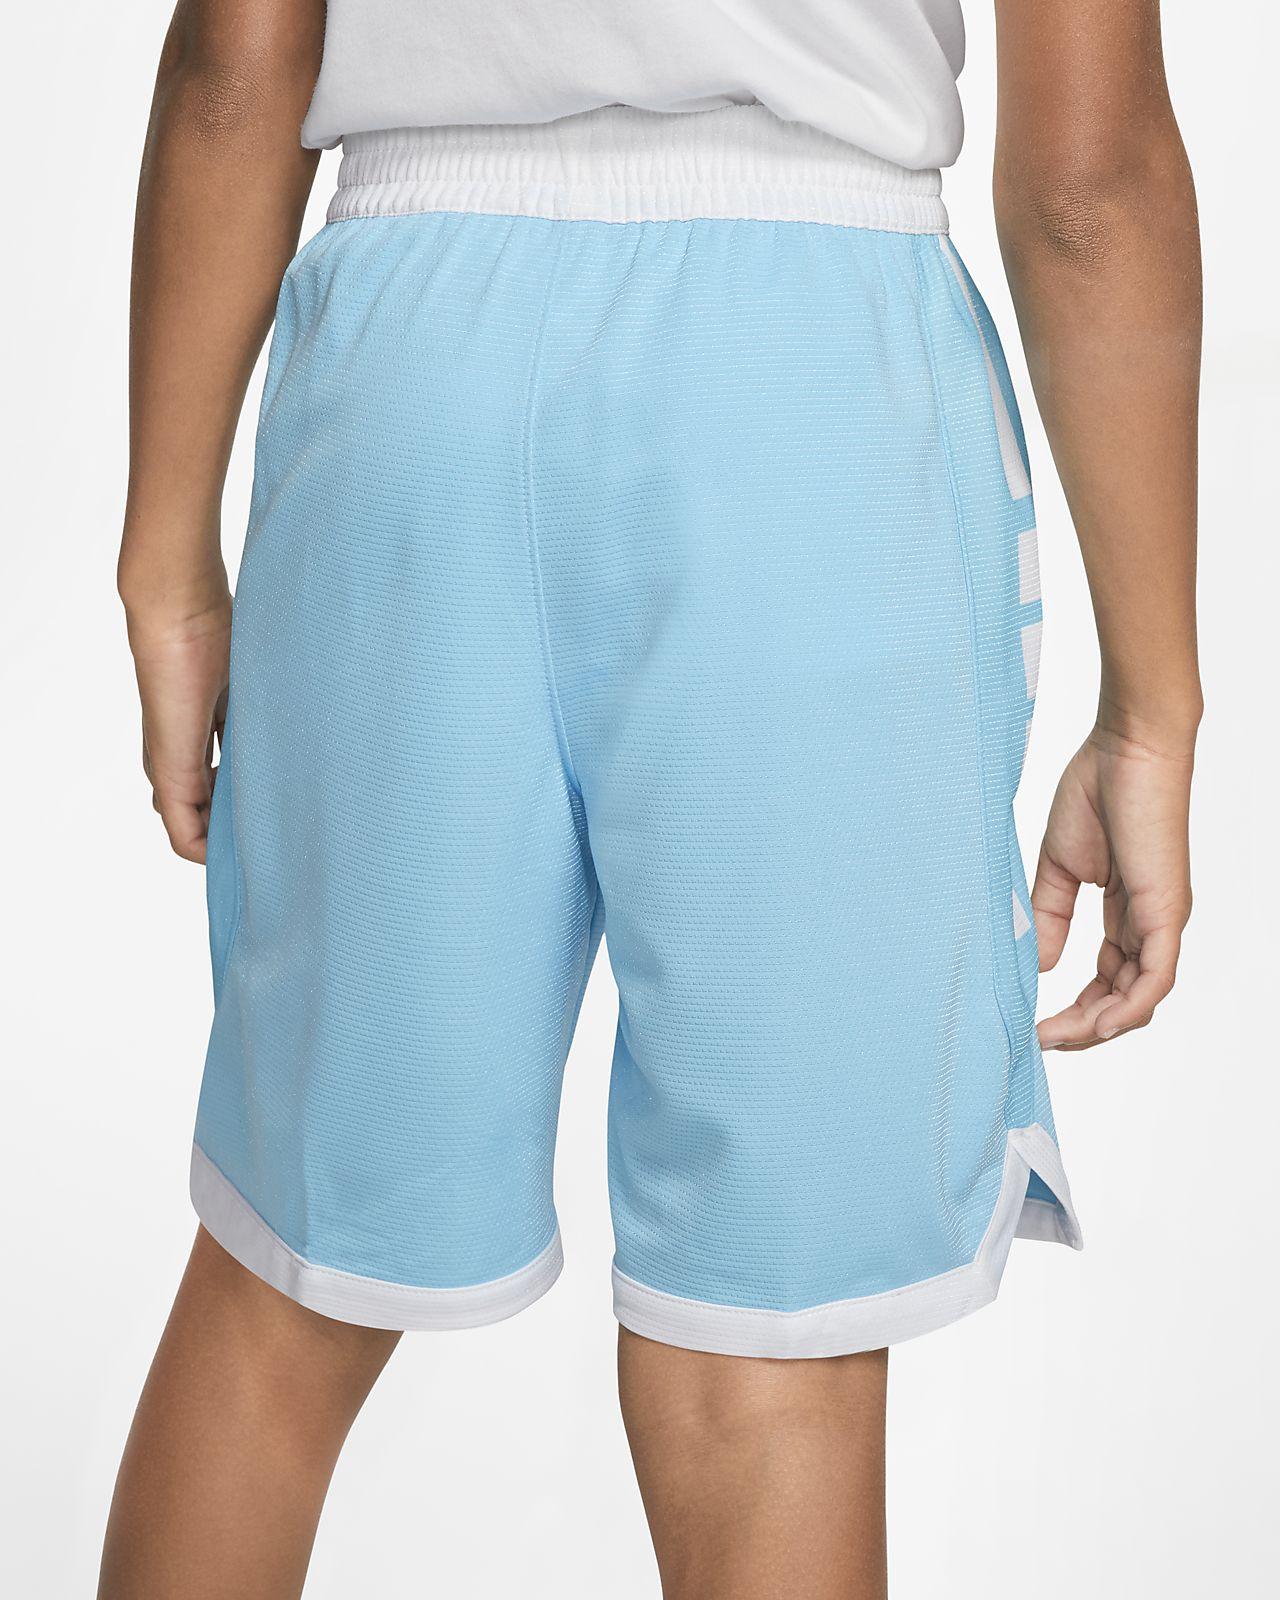 47251d741378 Nike Dri-FIT Big Kids  (Boys ) Basketball Shorts. Nike.com